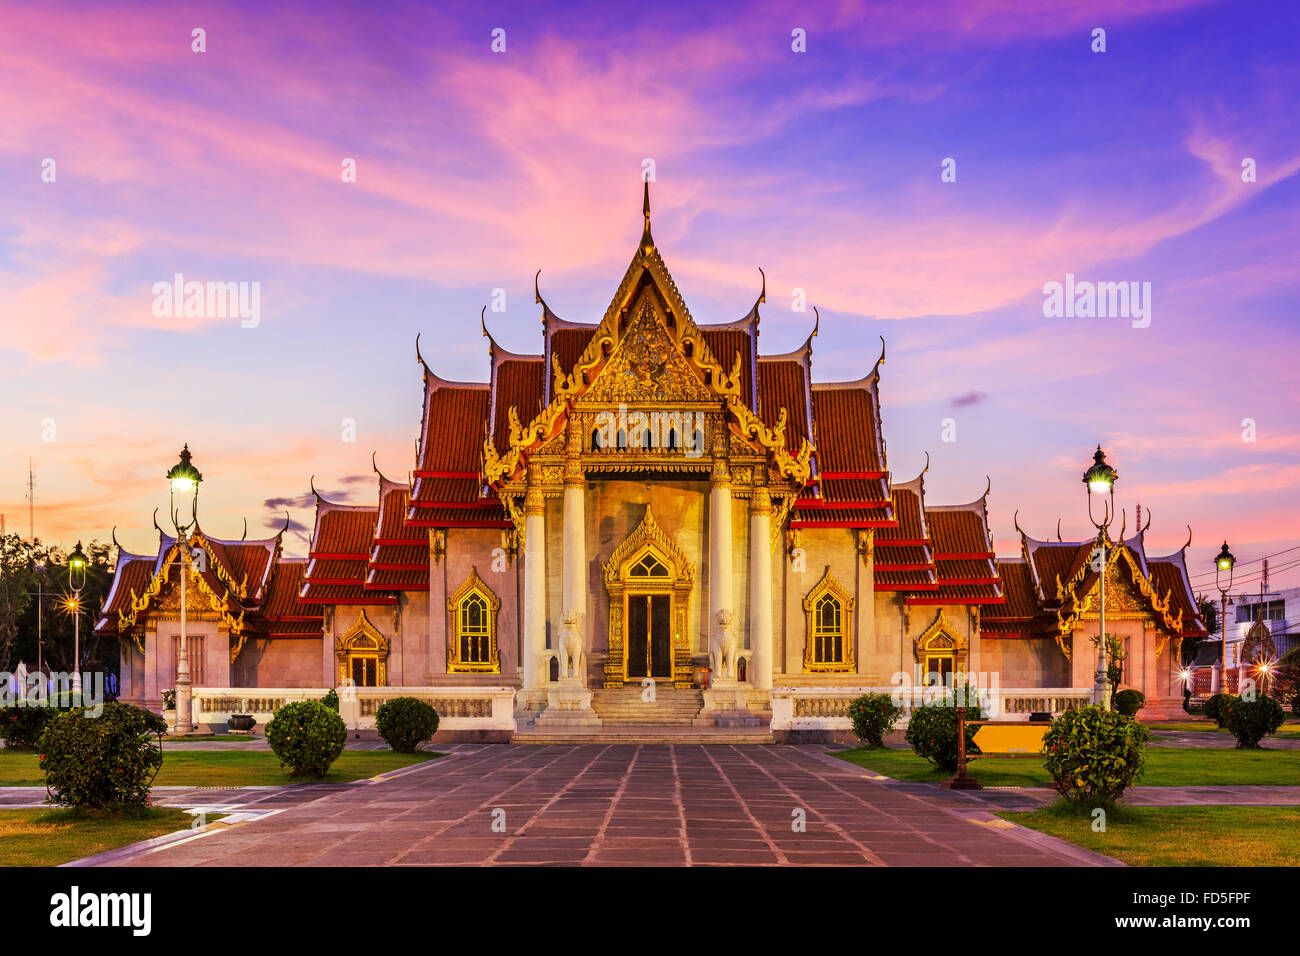 Bangkok, Tailandia. El Templo de mármol, Wat Benchamabopit Dusitvanaram al atardecer. Imagen De Stock